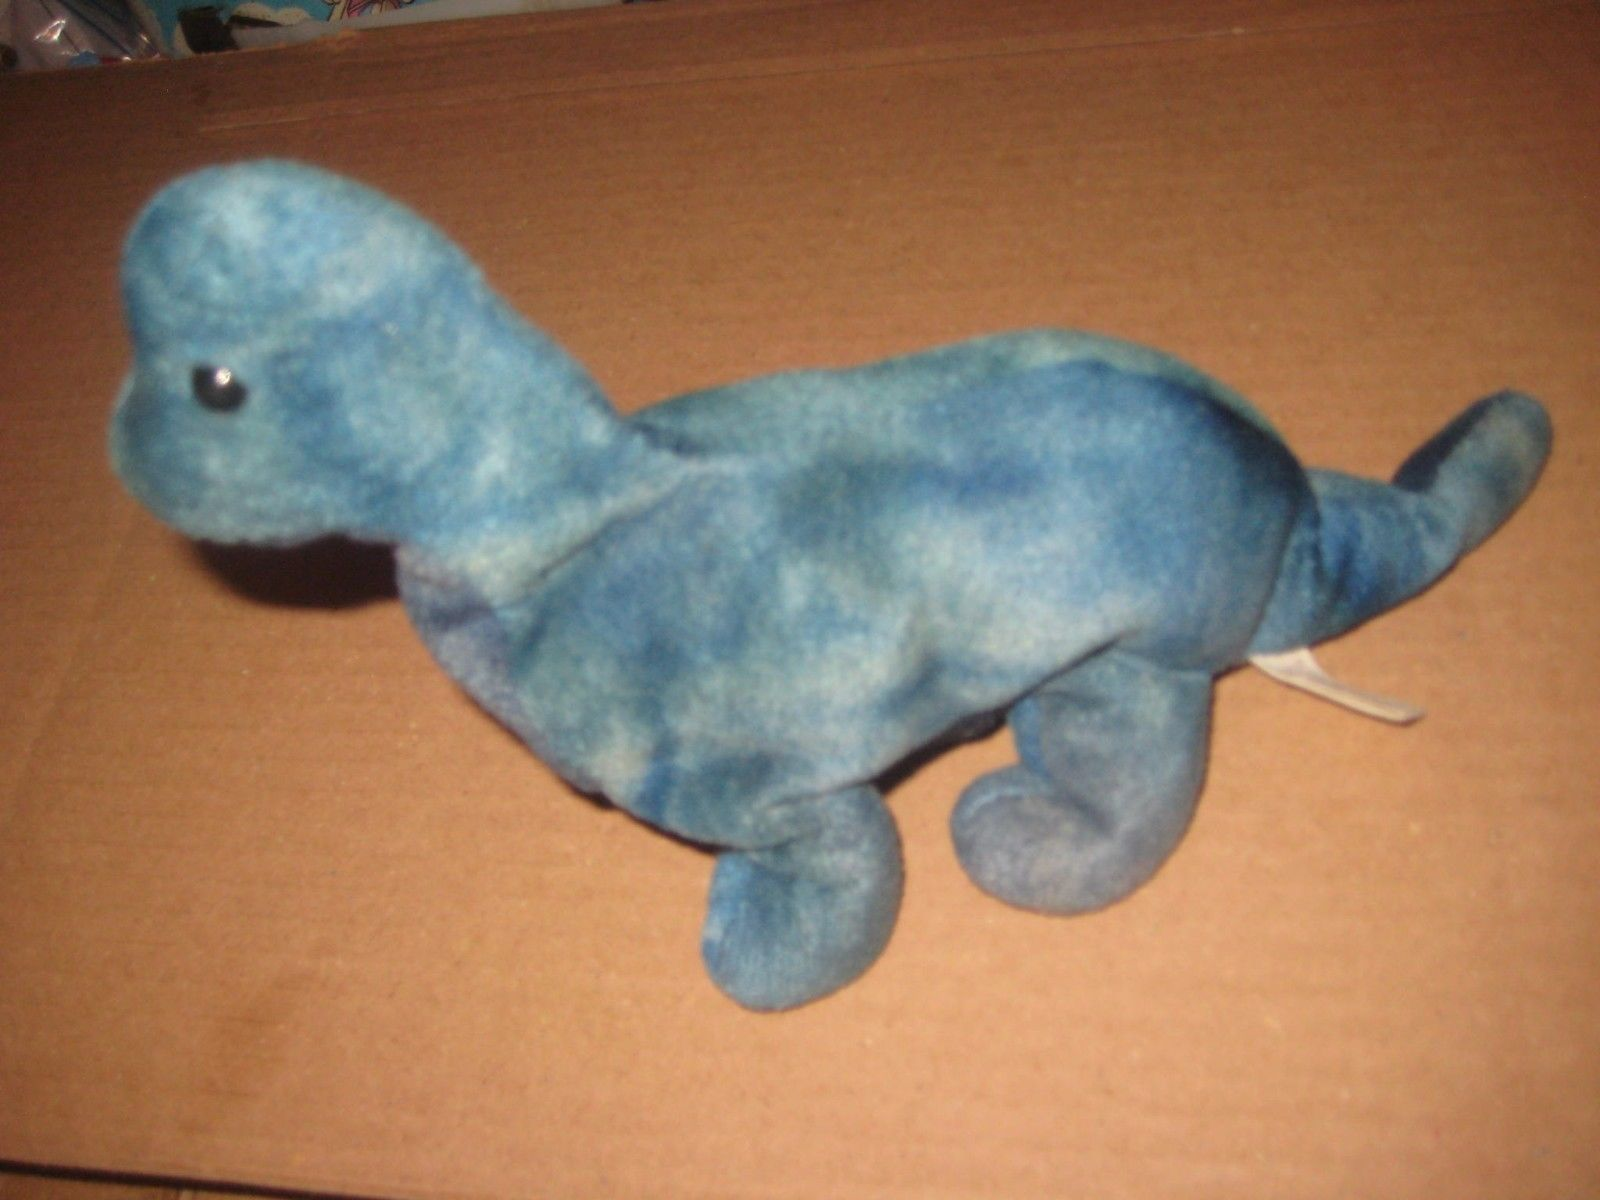 b5d0bb1e0b7 Beanie Baby Bronty the Brontosaurus 1995 and 50 similar items. S l1600